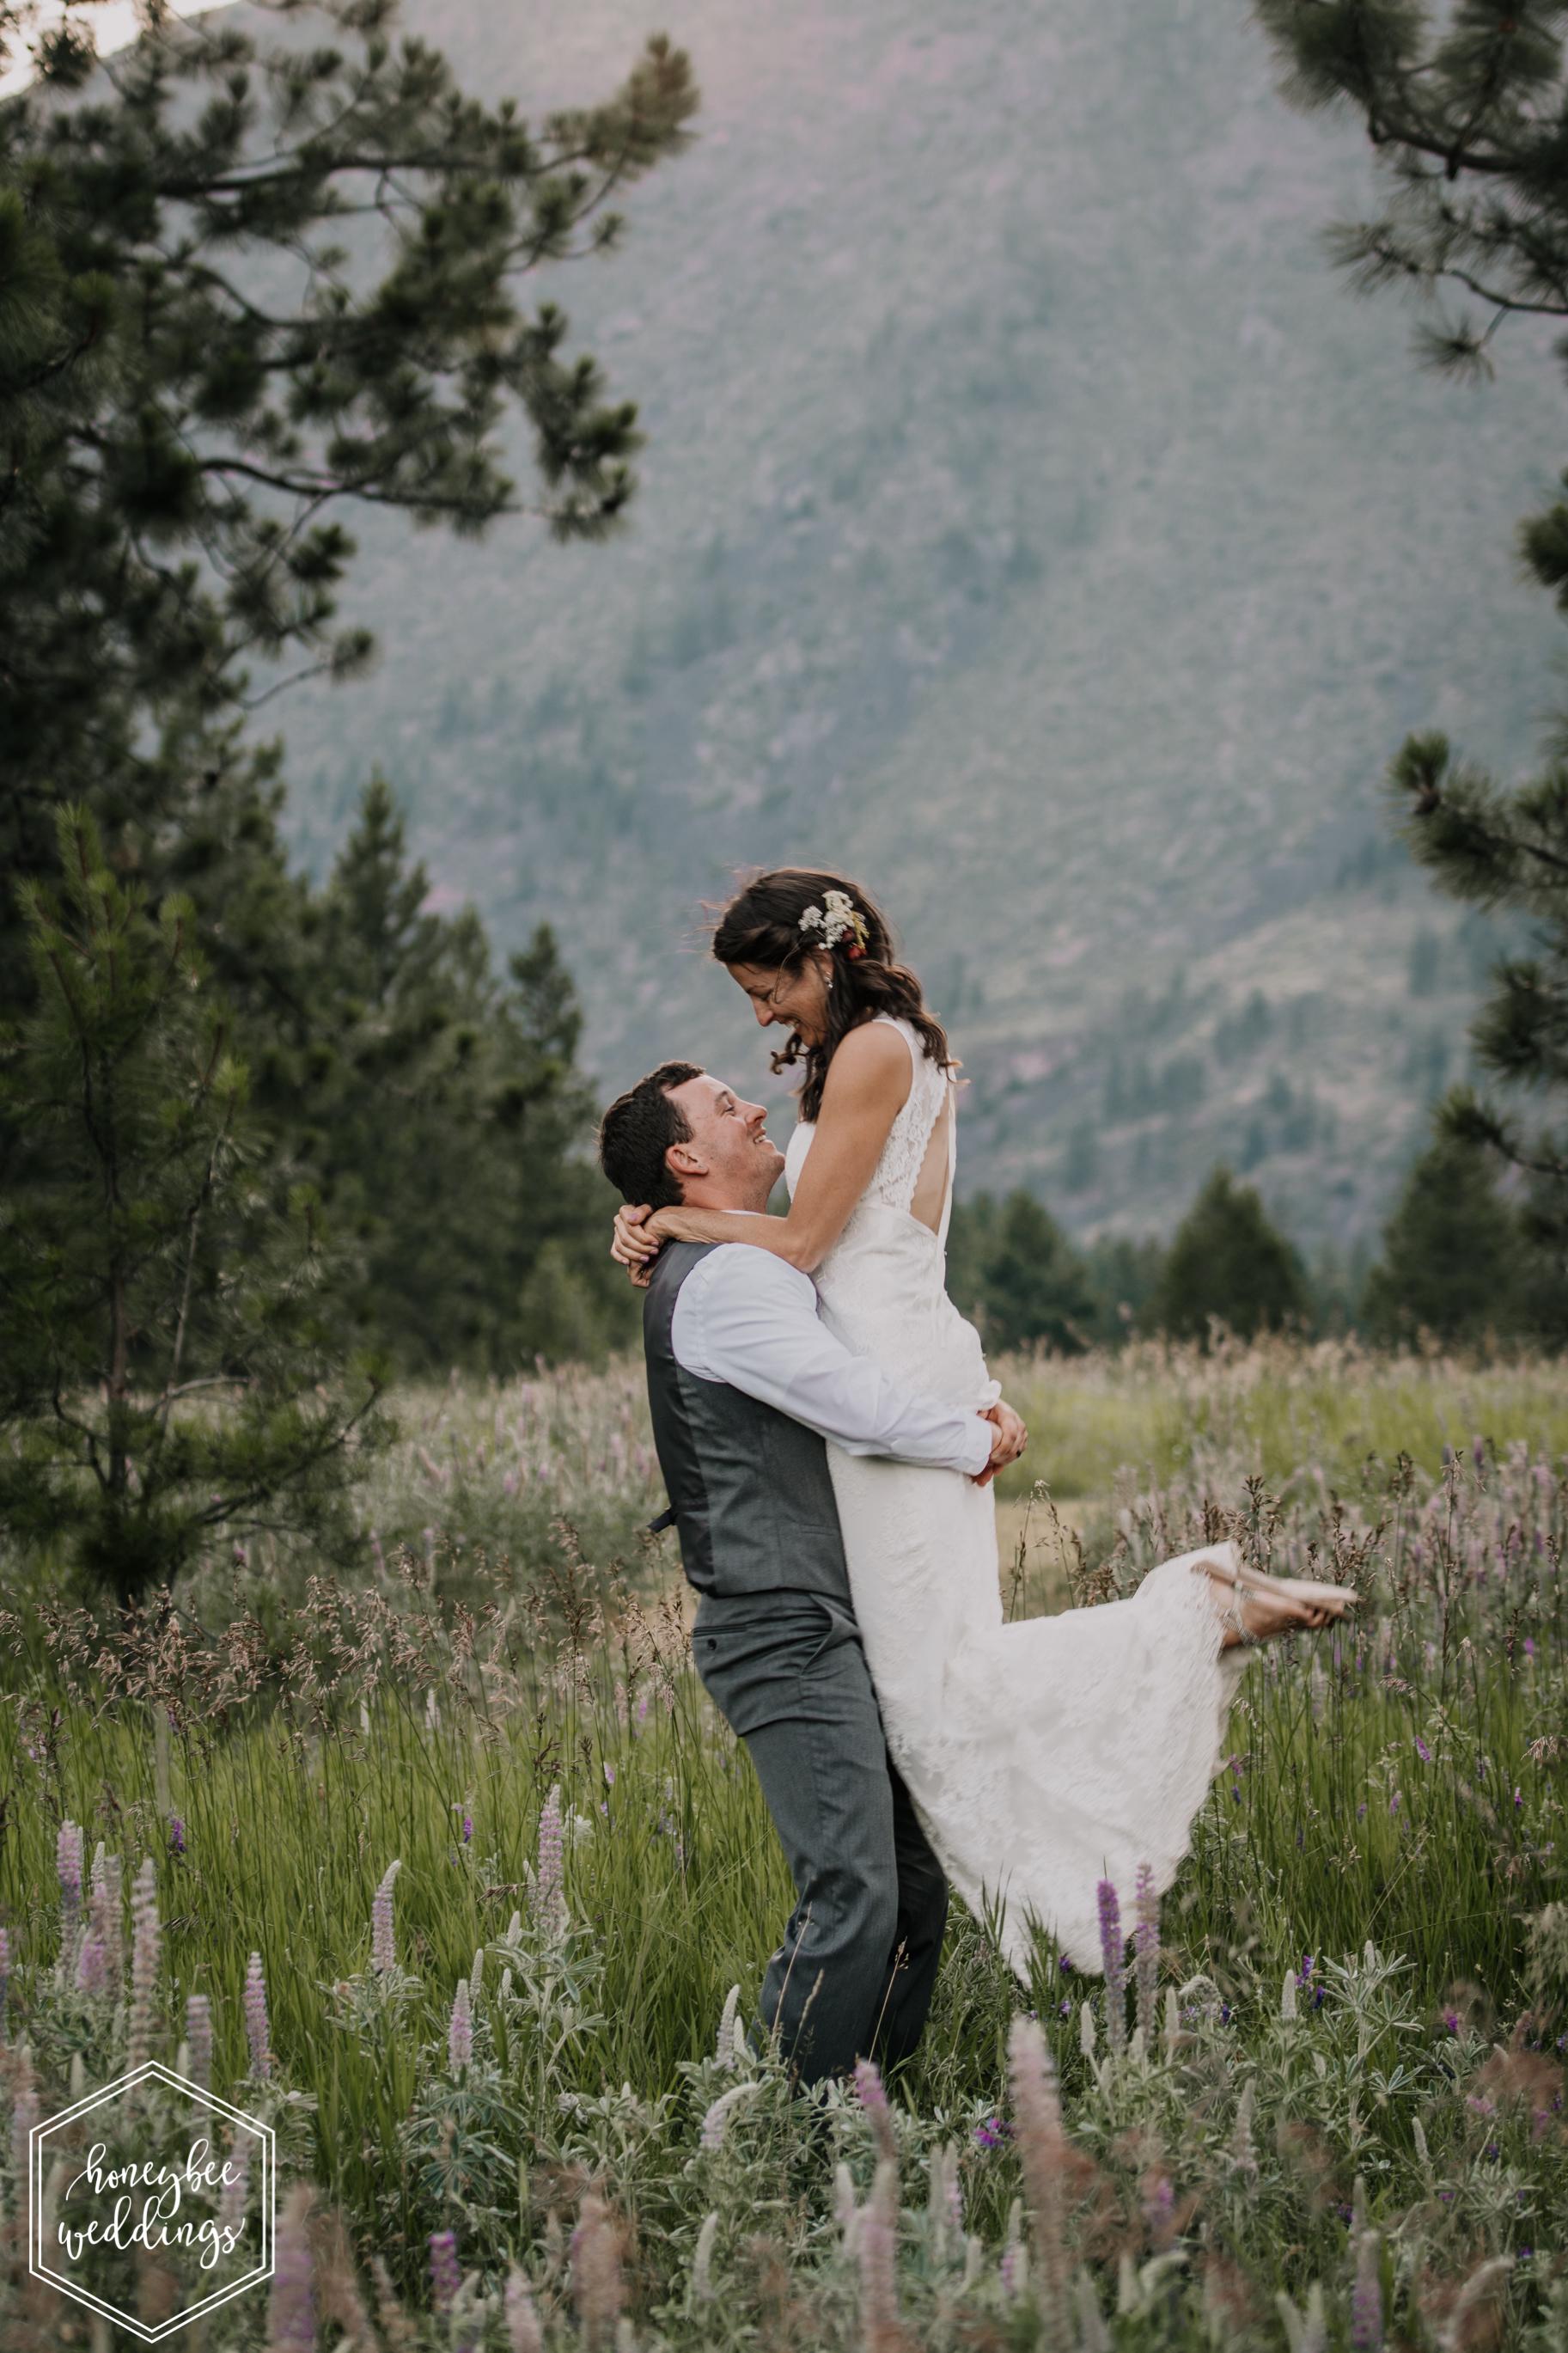 561 White Raven Wedding_Montana Wedding Photographer_Honeybee Weddings_ Meghan Maloney + Arza Hammond 2018-0244.jpg